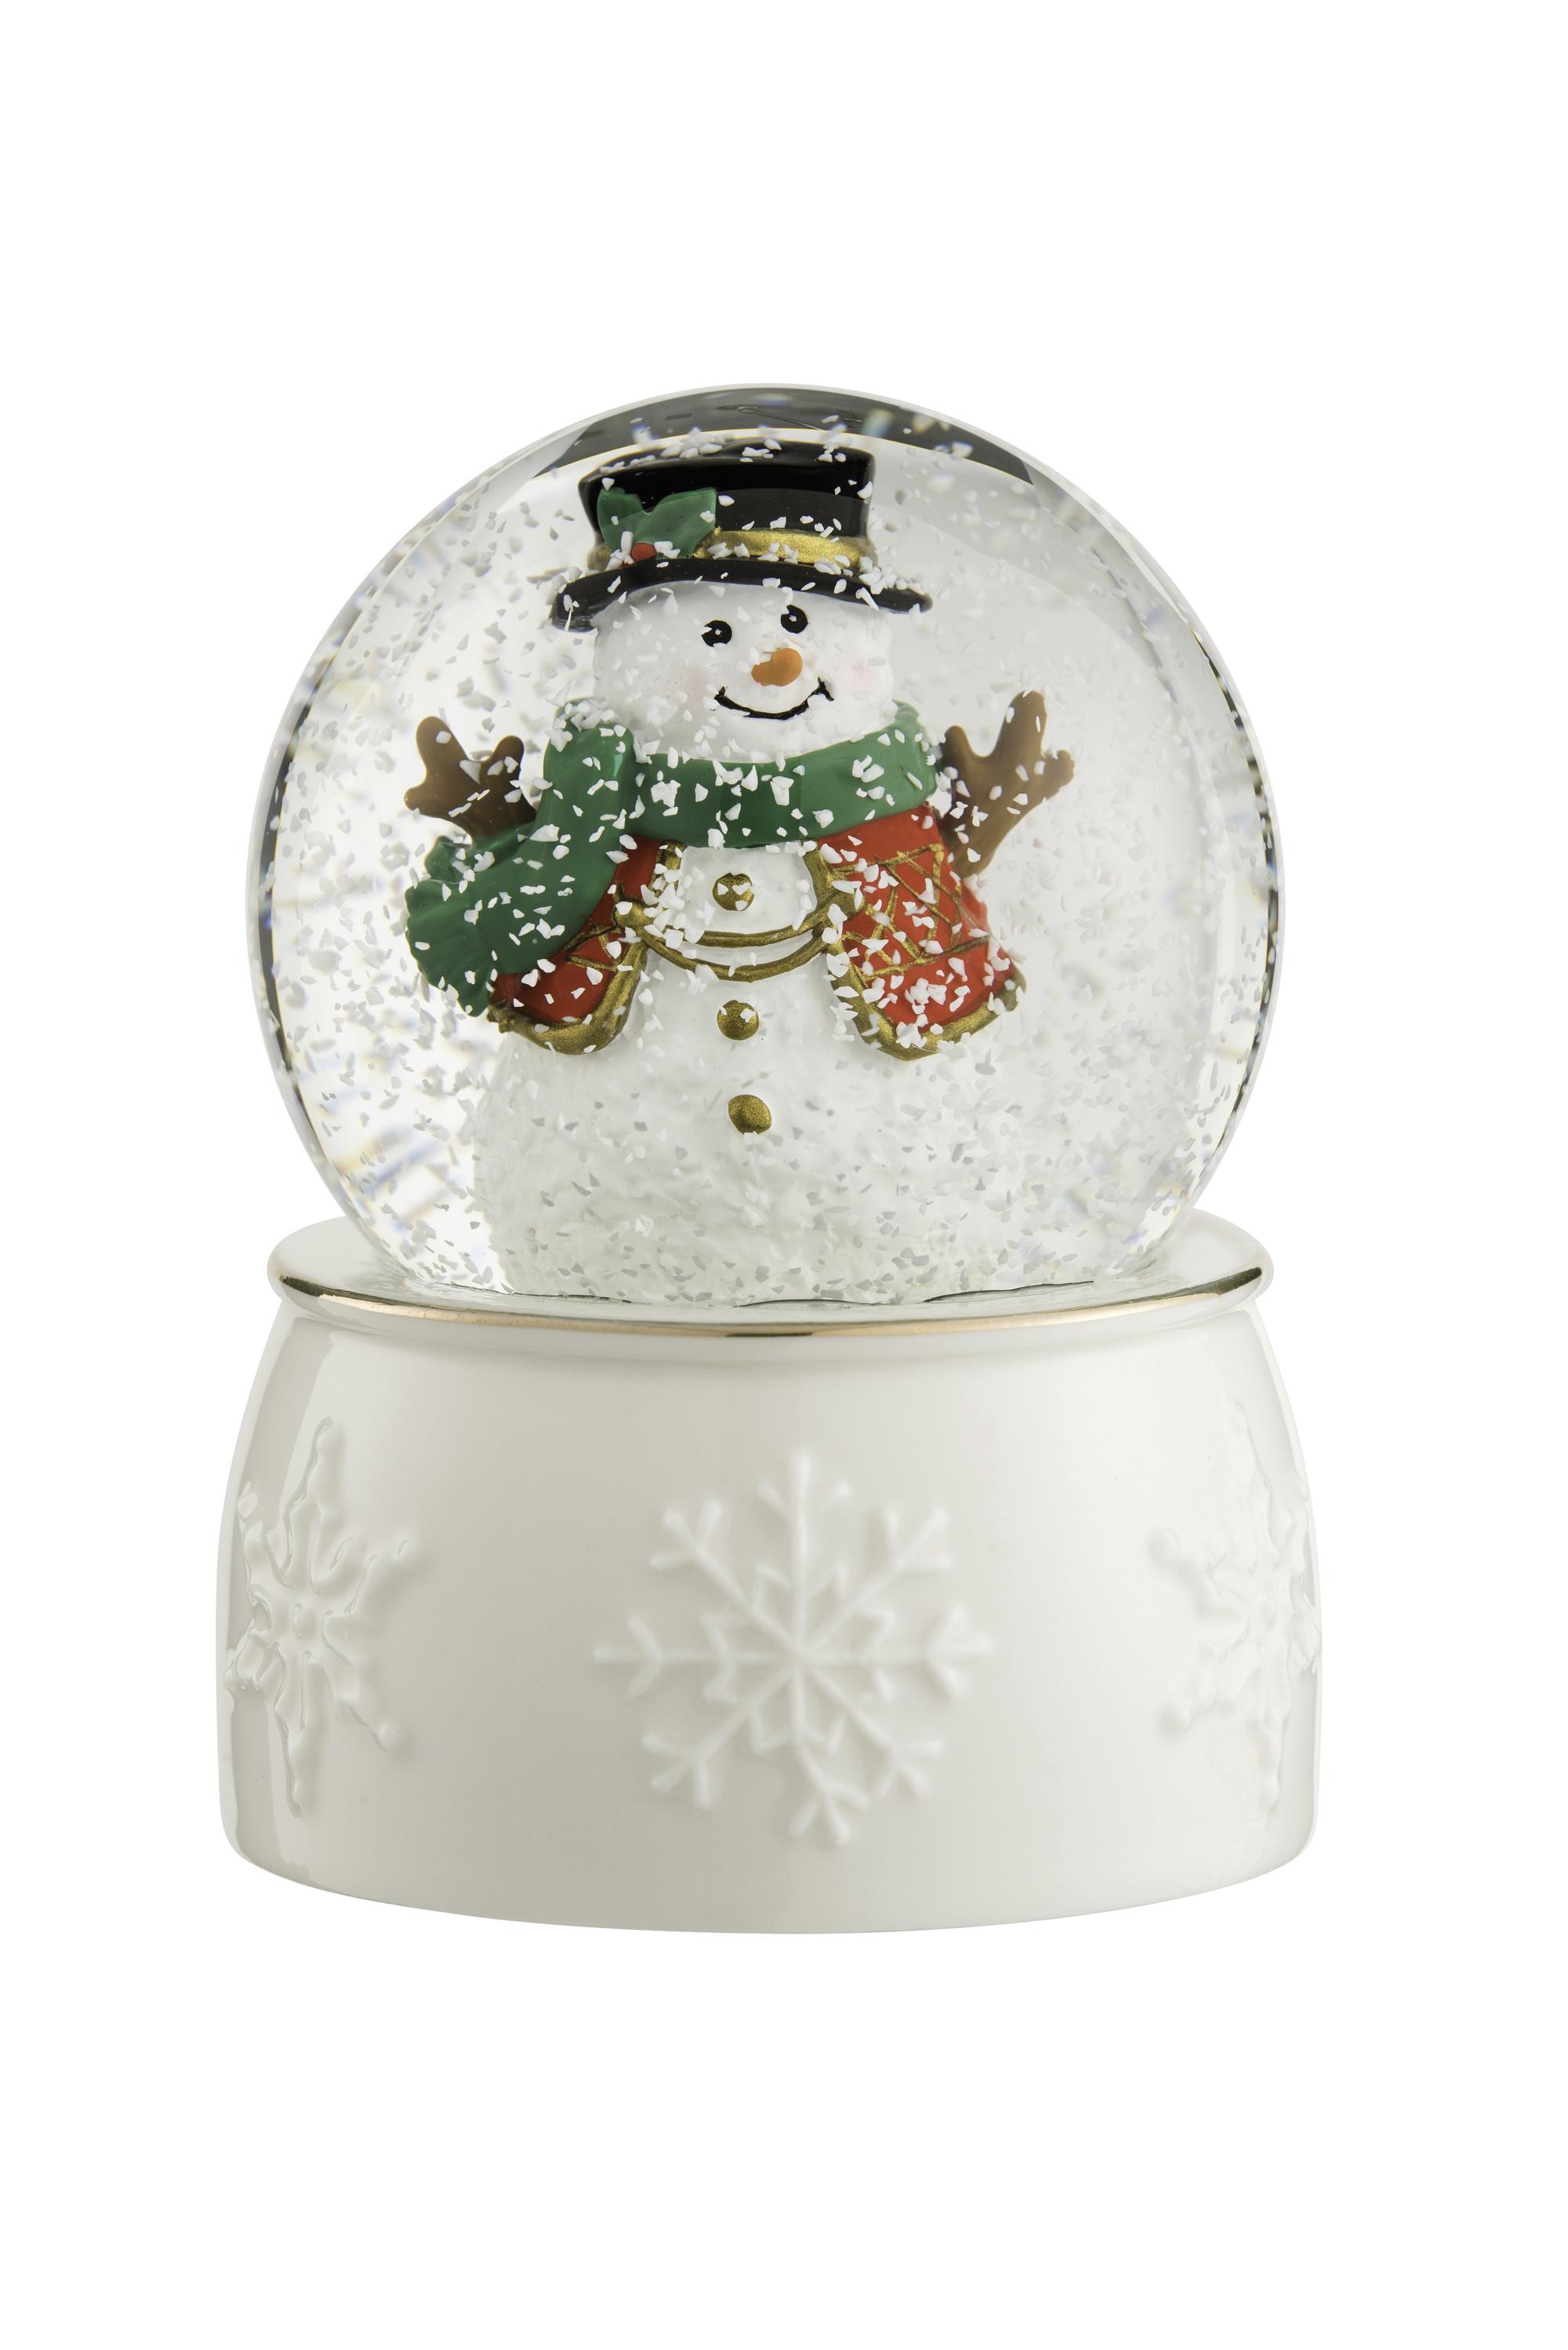 Irish Christmas - Belleek Snowman Snowglobe at IrishShop.com | HMBL10287